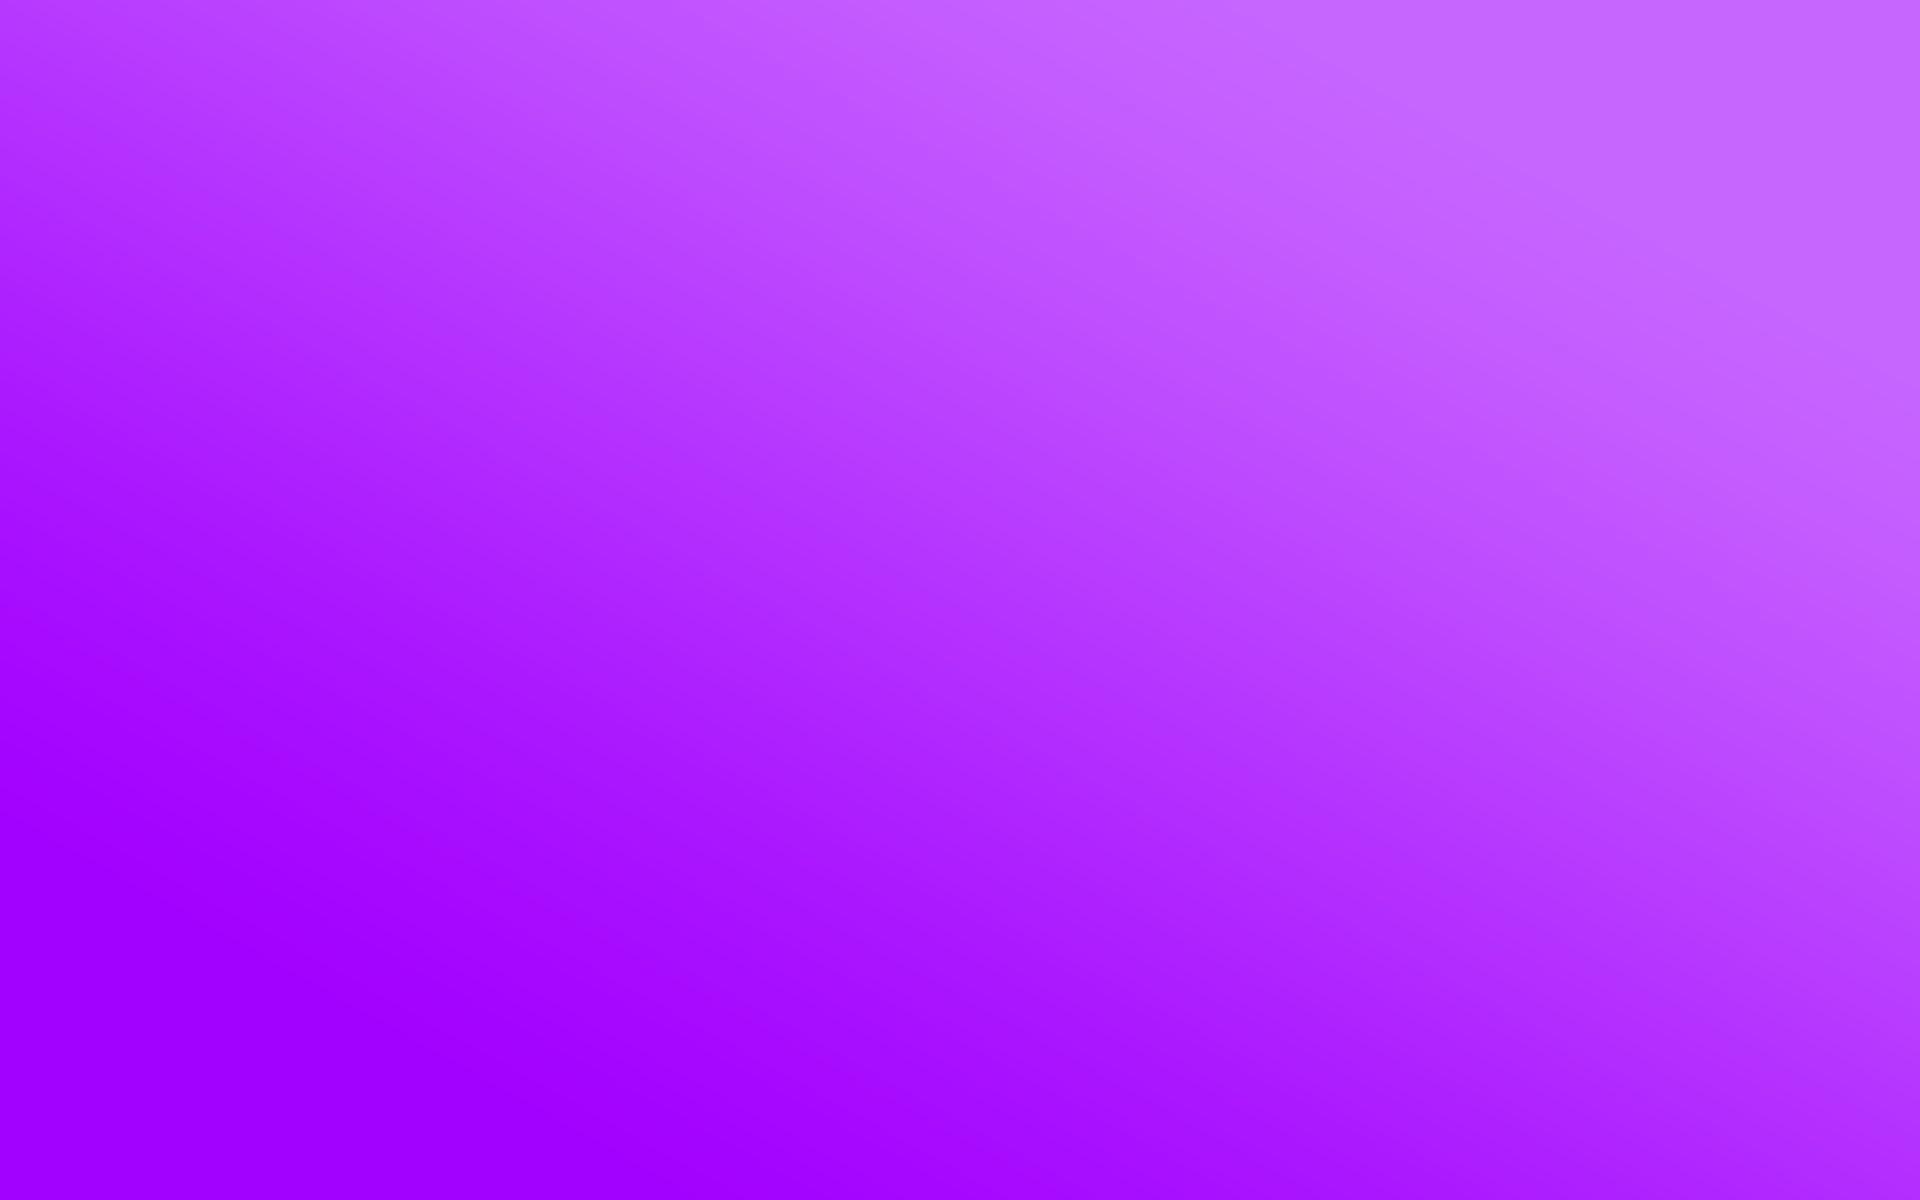 purple wallpaper 3 - photo #34